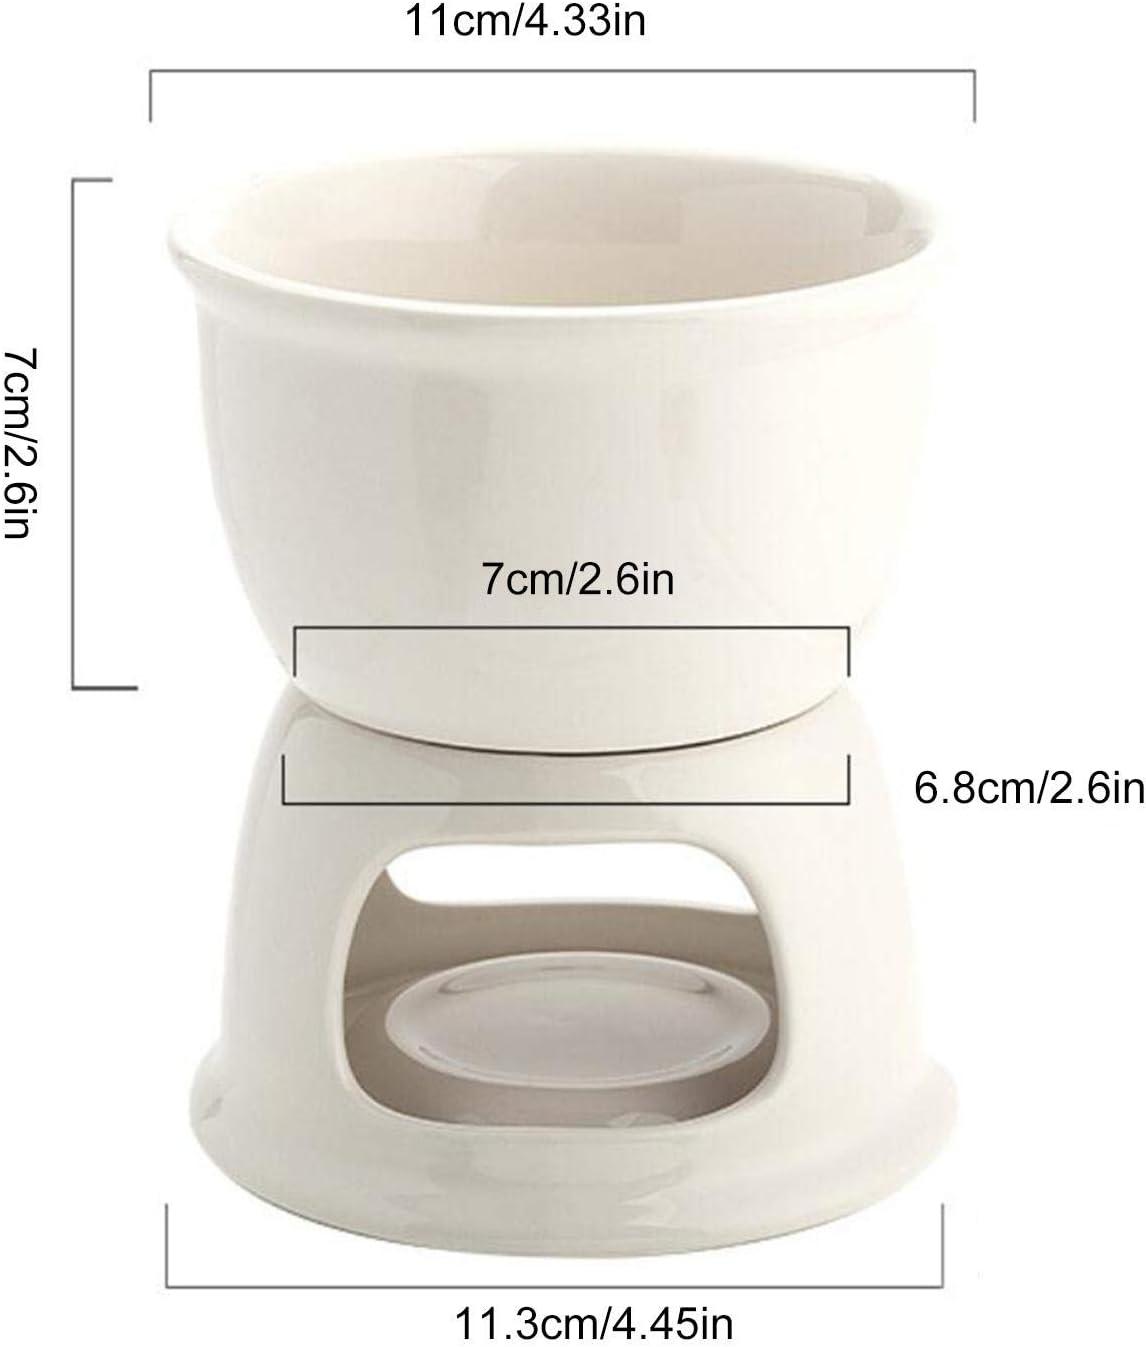 High grade Ceramic Chocolate Melting Furnace Fondue For Melting Cheese Cheese And Chocolate WXGY Cheese And Chocolate Melting Pot